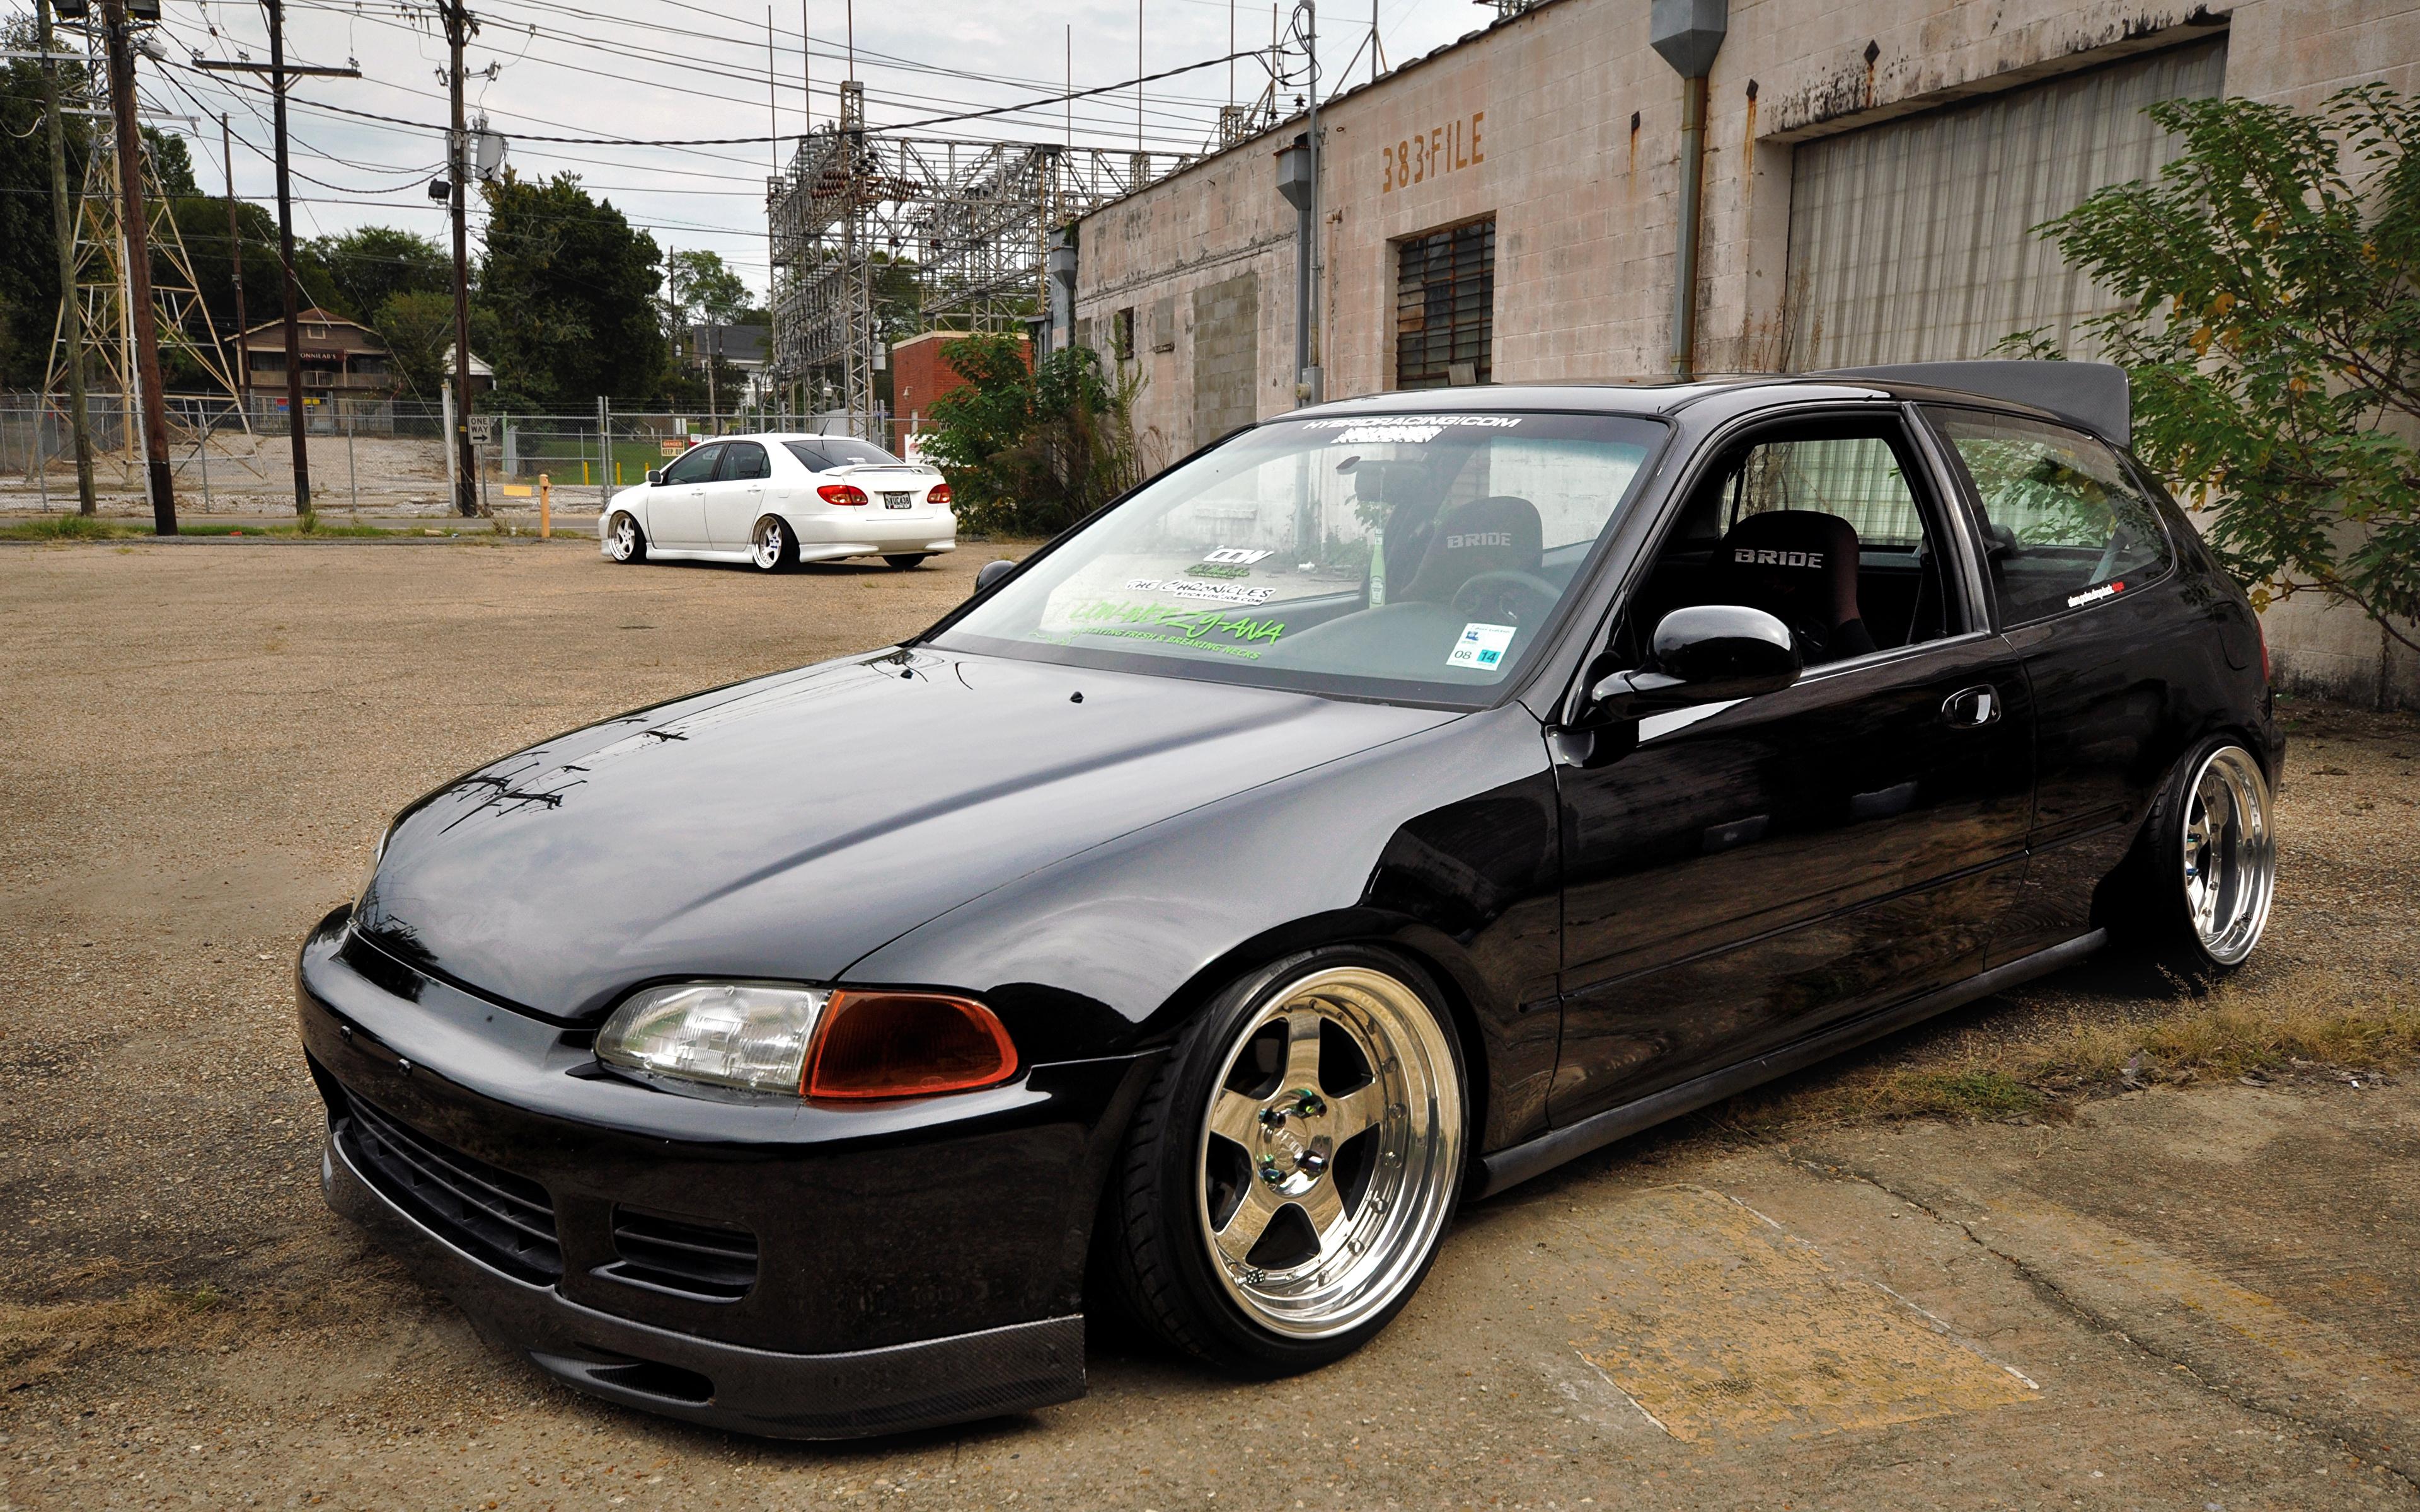 Photos Honda Civic eg6 Stance BellyScrapers Low CCW Black 3840x2400 3840x2400